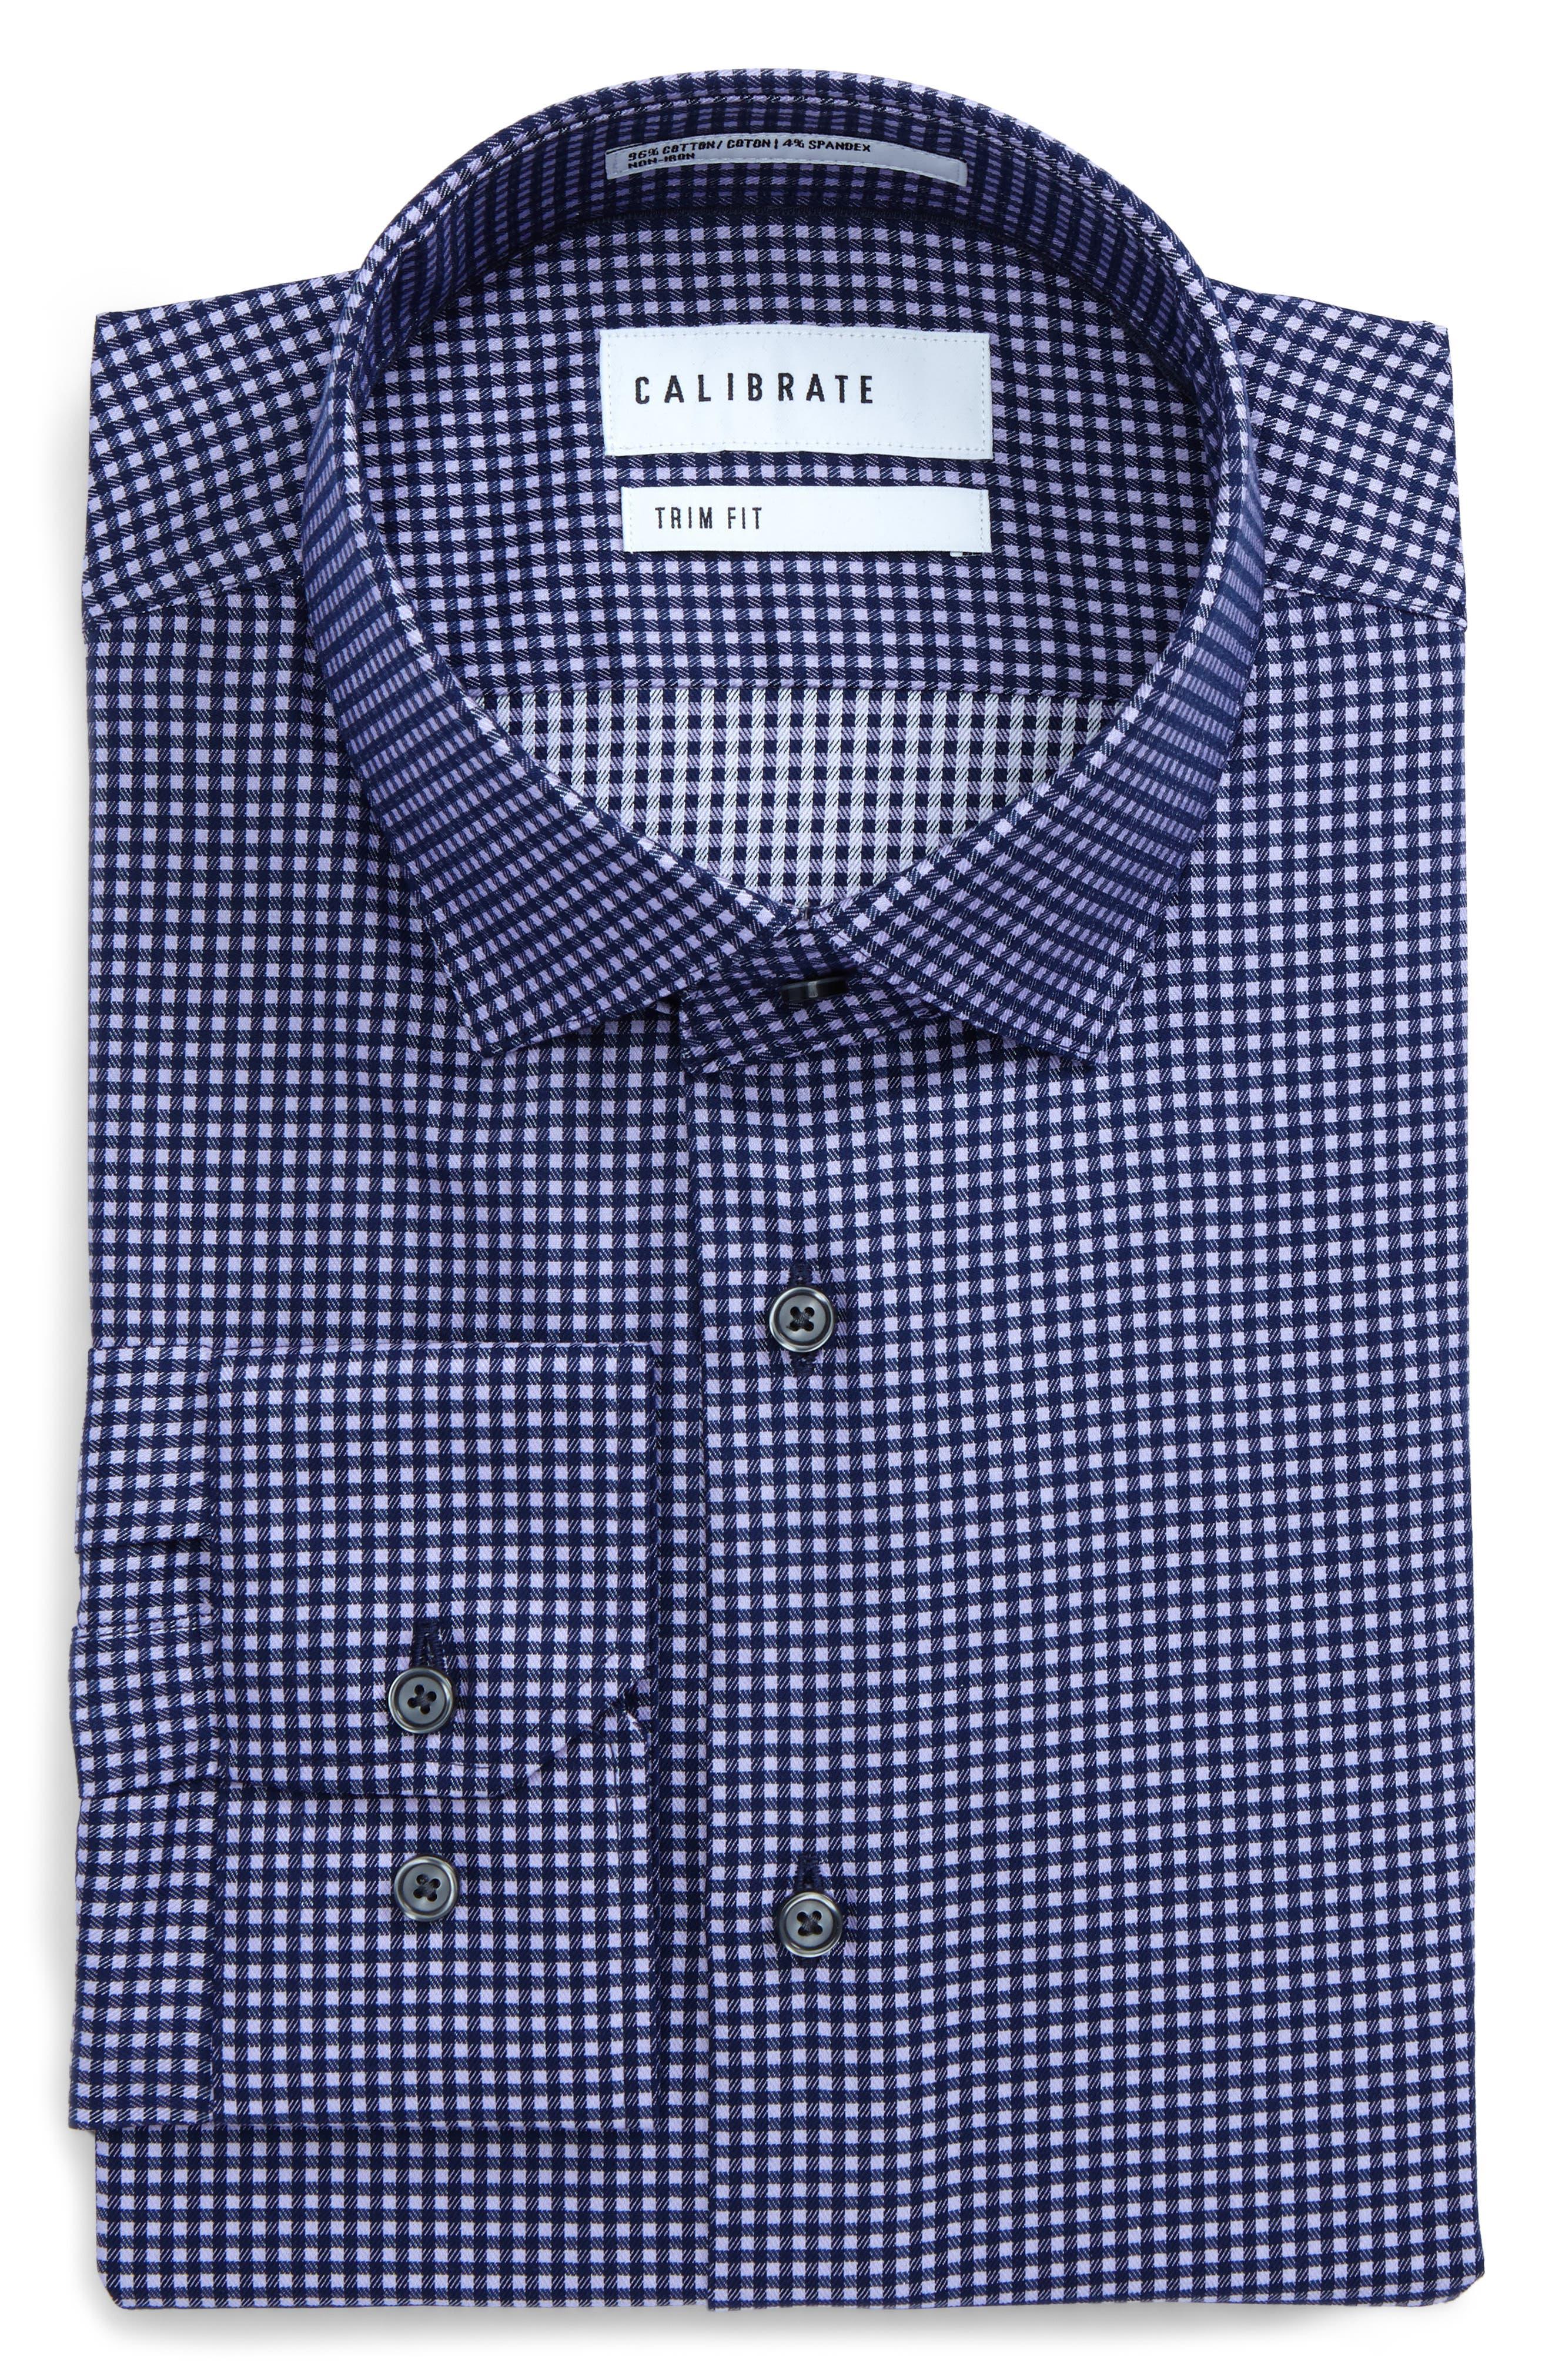 Main Image - Calibrate Trim Fit Stretch Check Dress Shirt